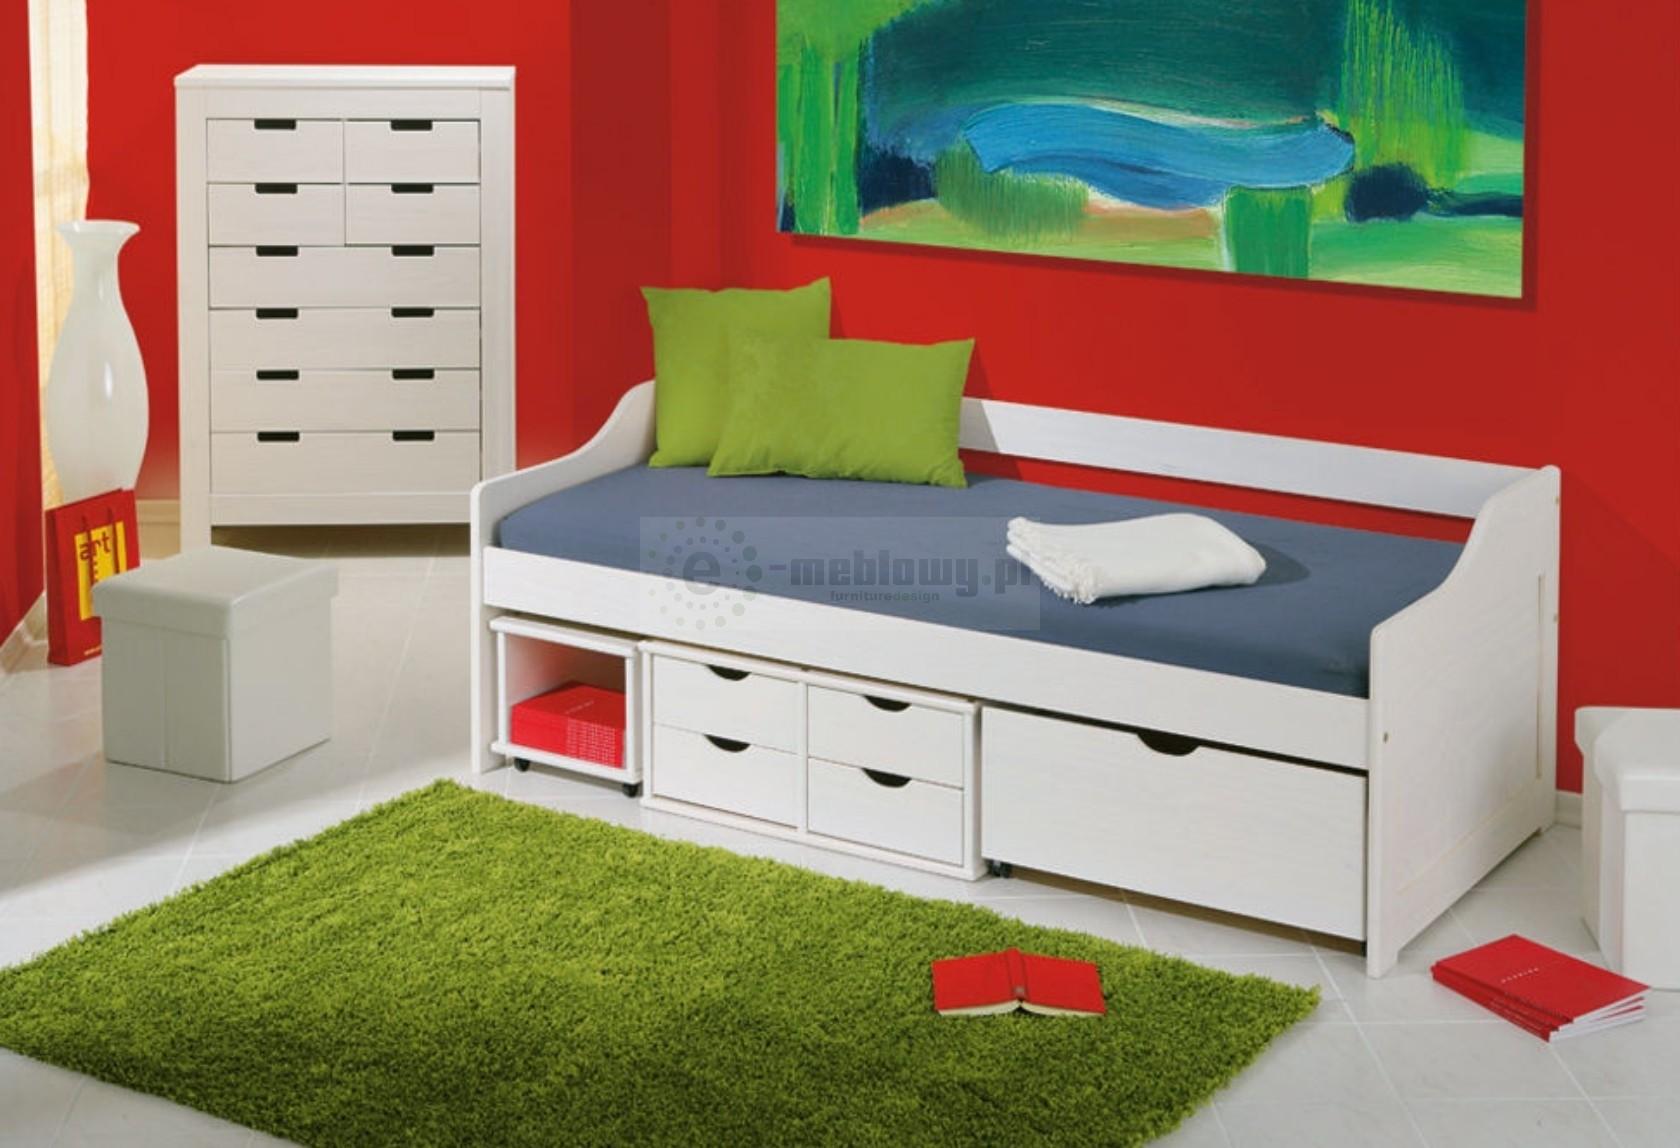 ko dzieci ce simple ko dzieci ce ko dla dziecka ka dzieci ce. Black Bedroom Furniture Sets. Home Design Ideas